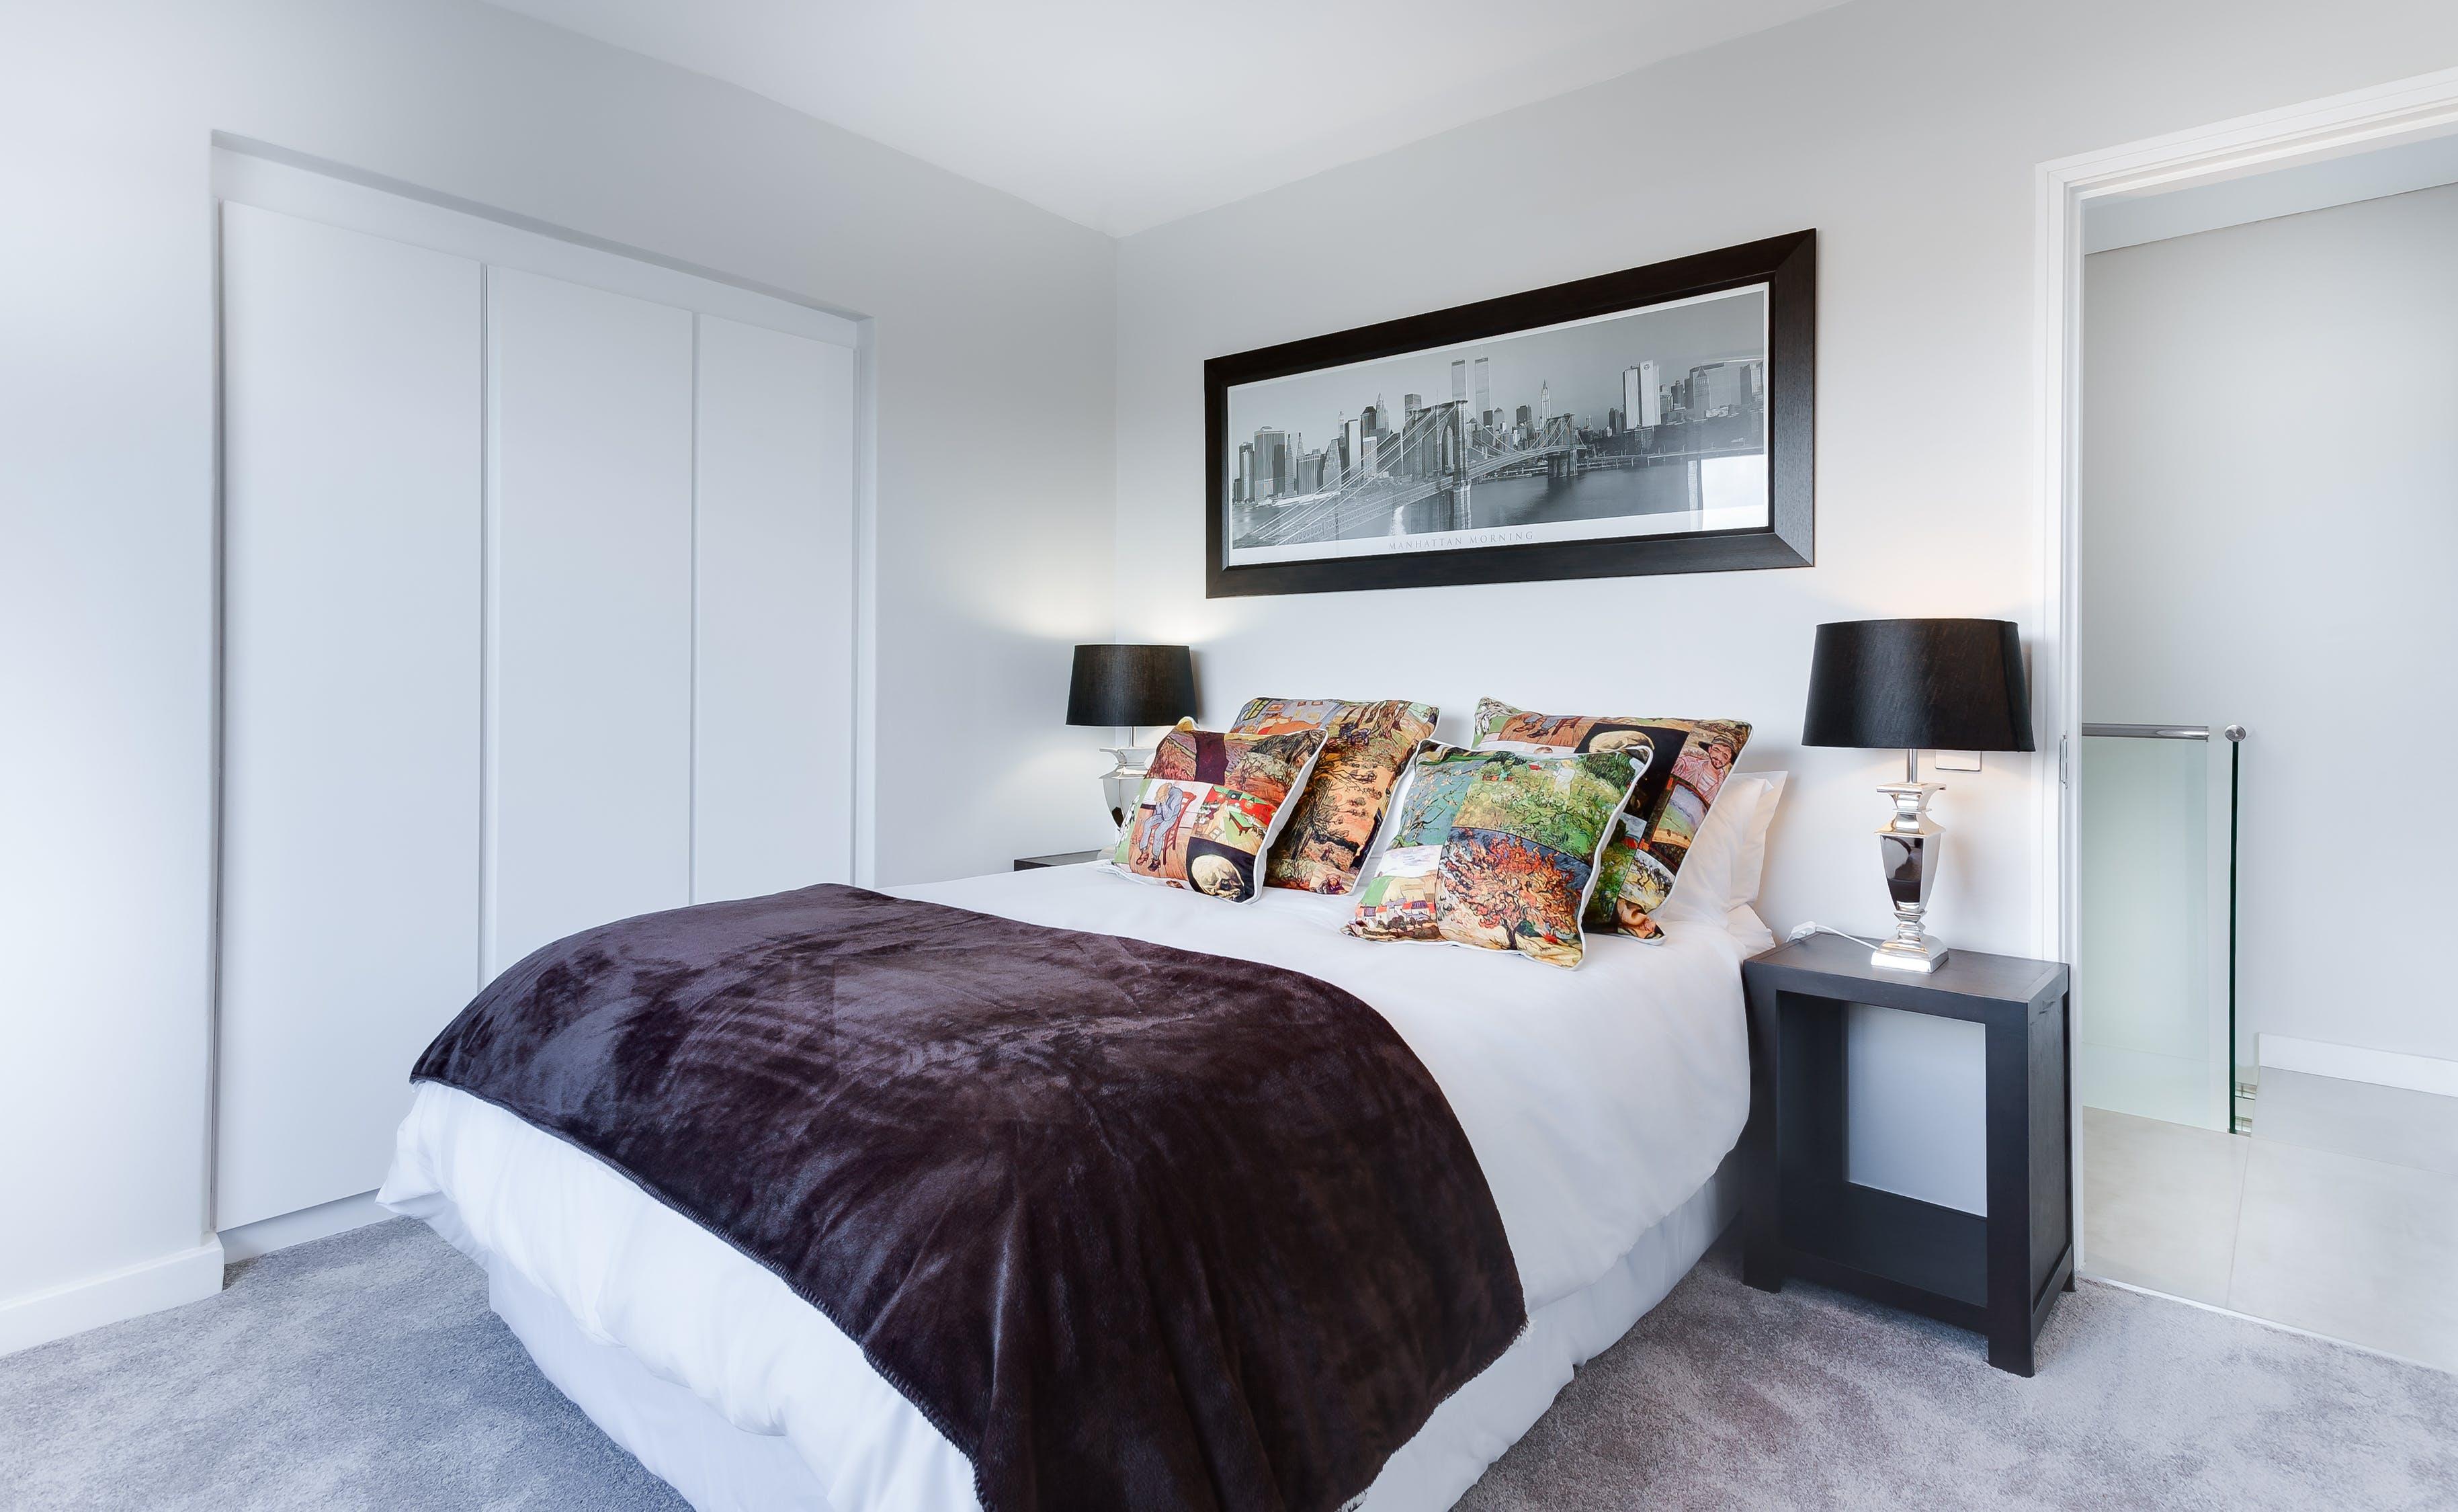 ložnice, postel a nábytek